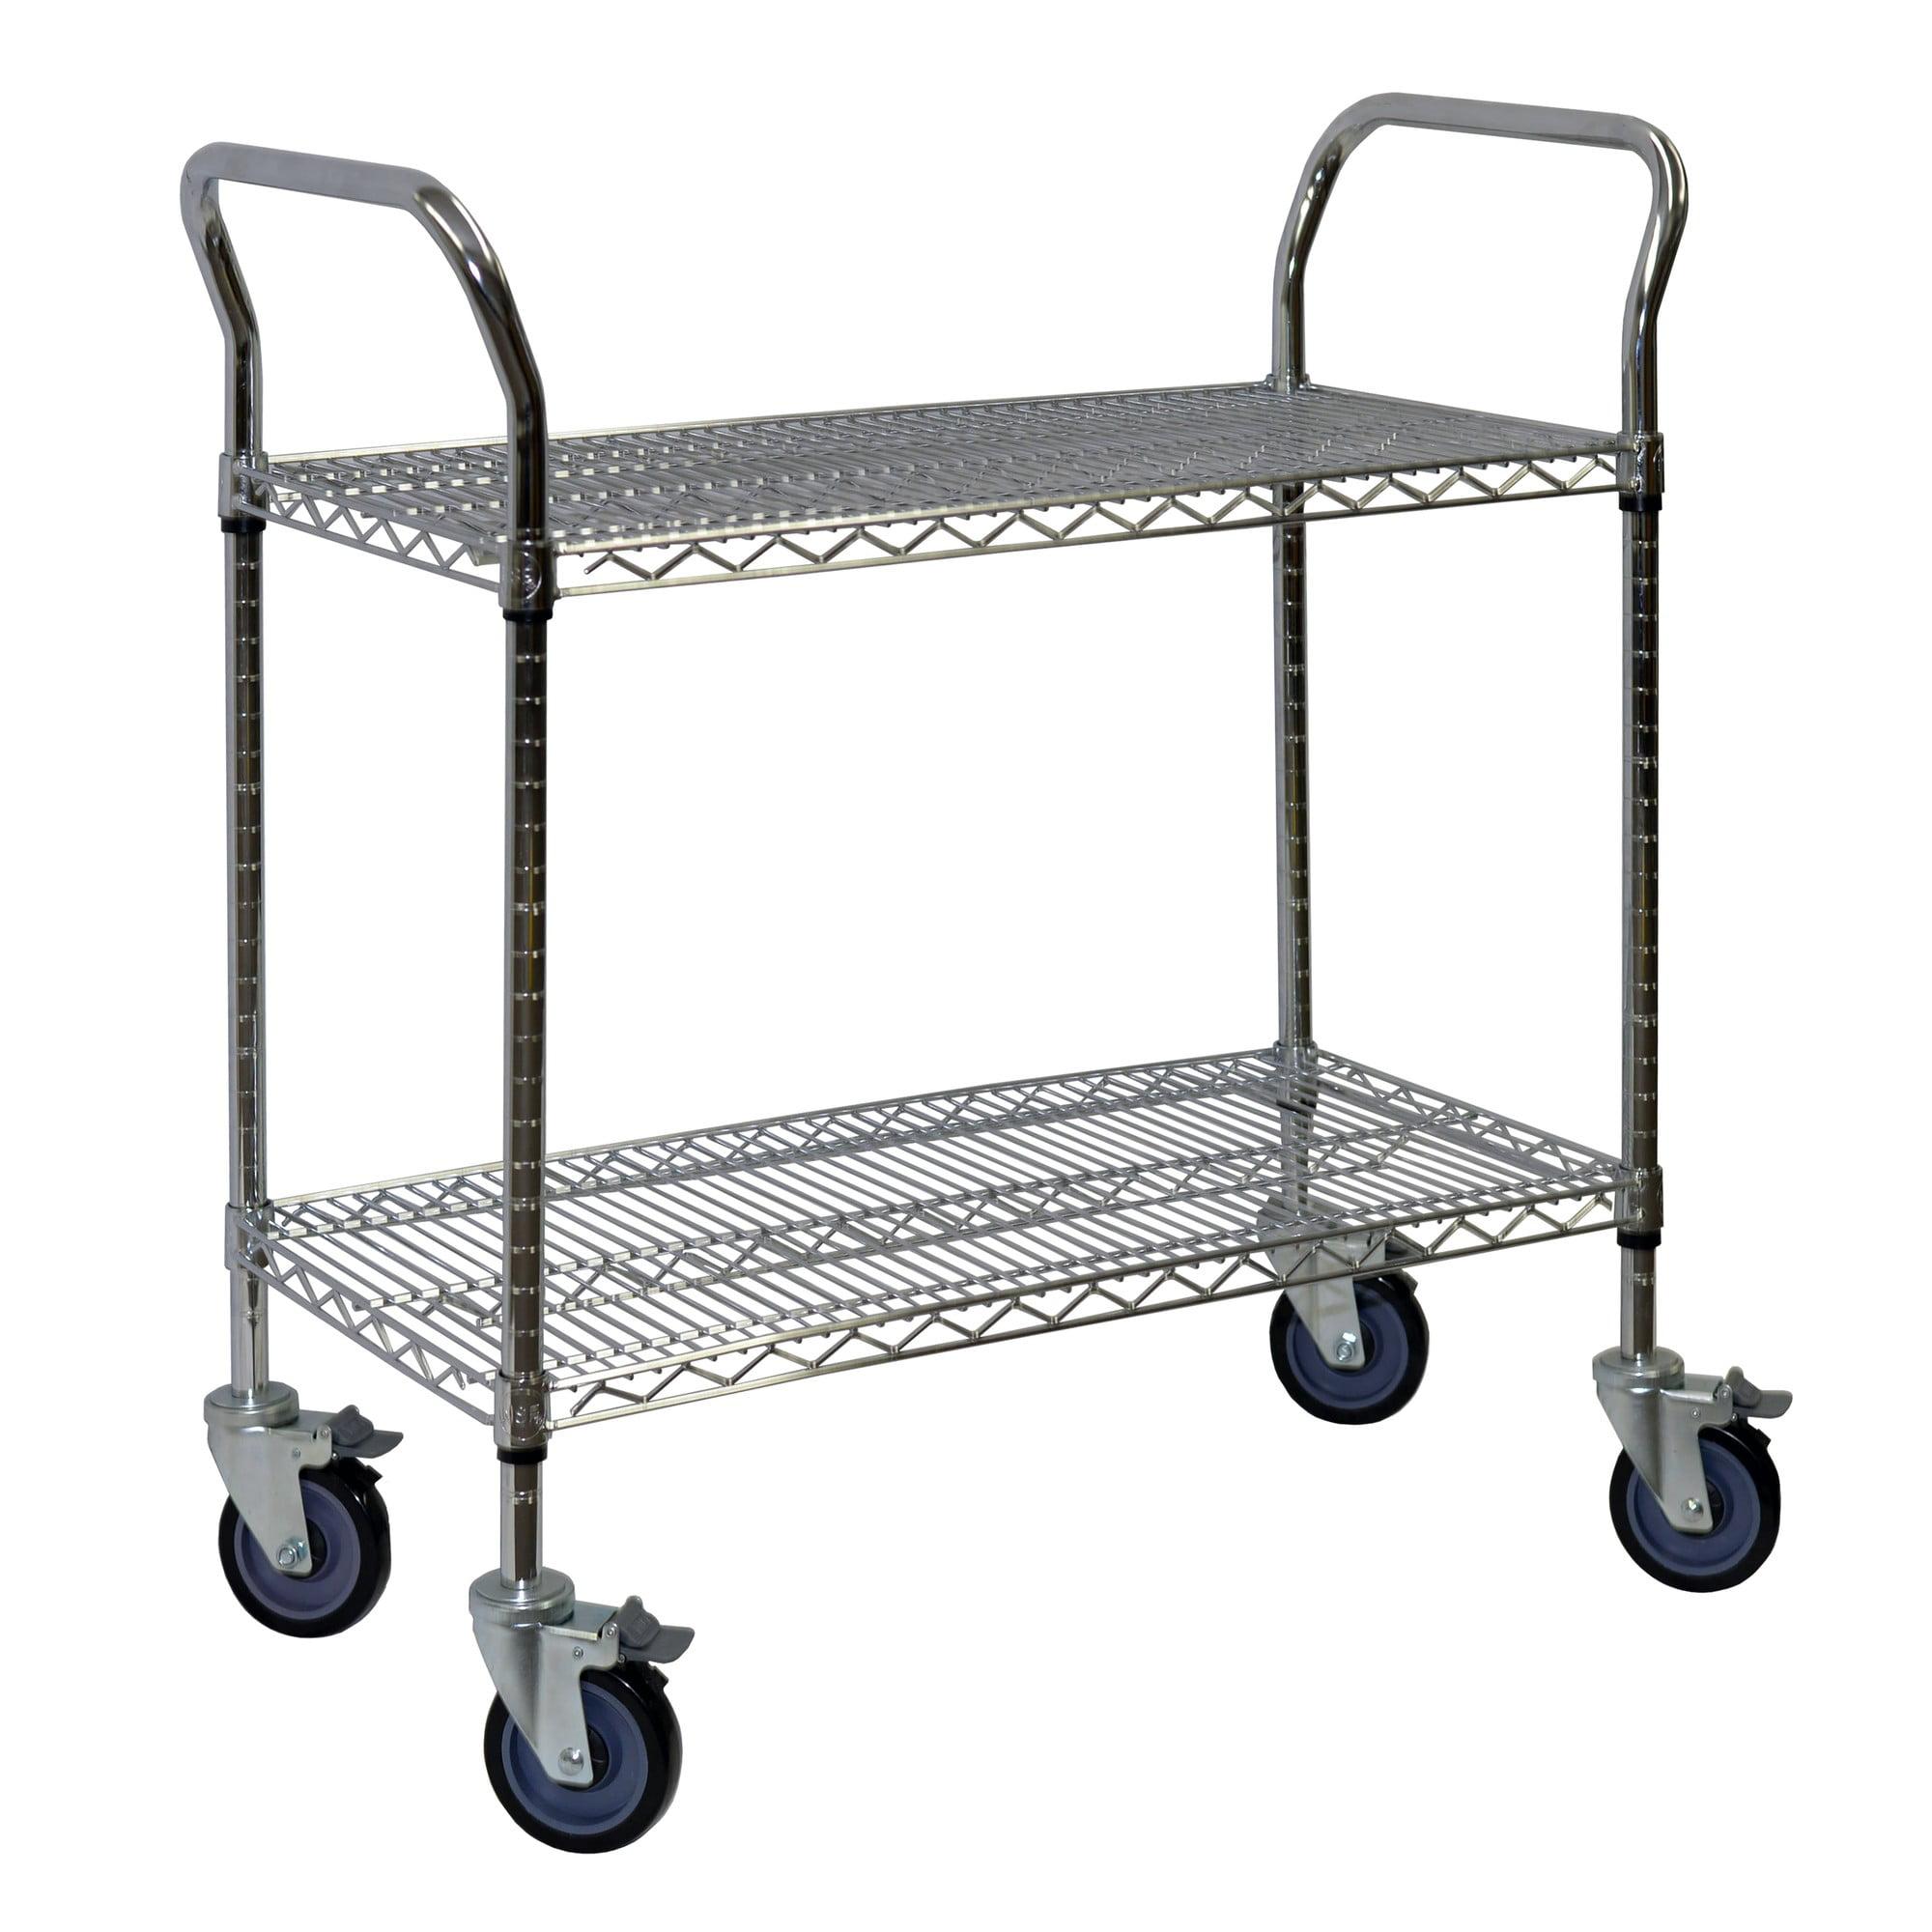 Storage Max Chrome Wire Shelving Cart, 24 x 36, 2 Shelves